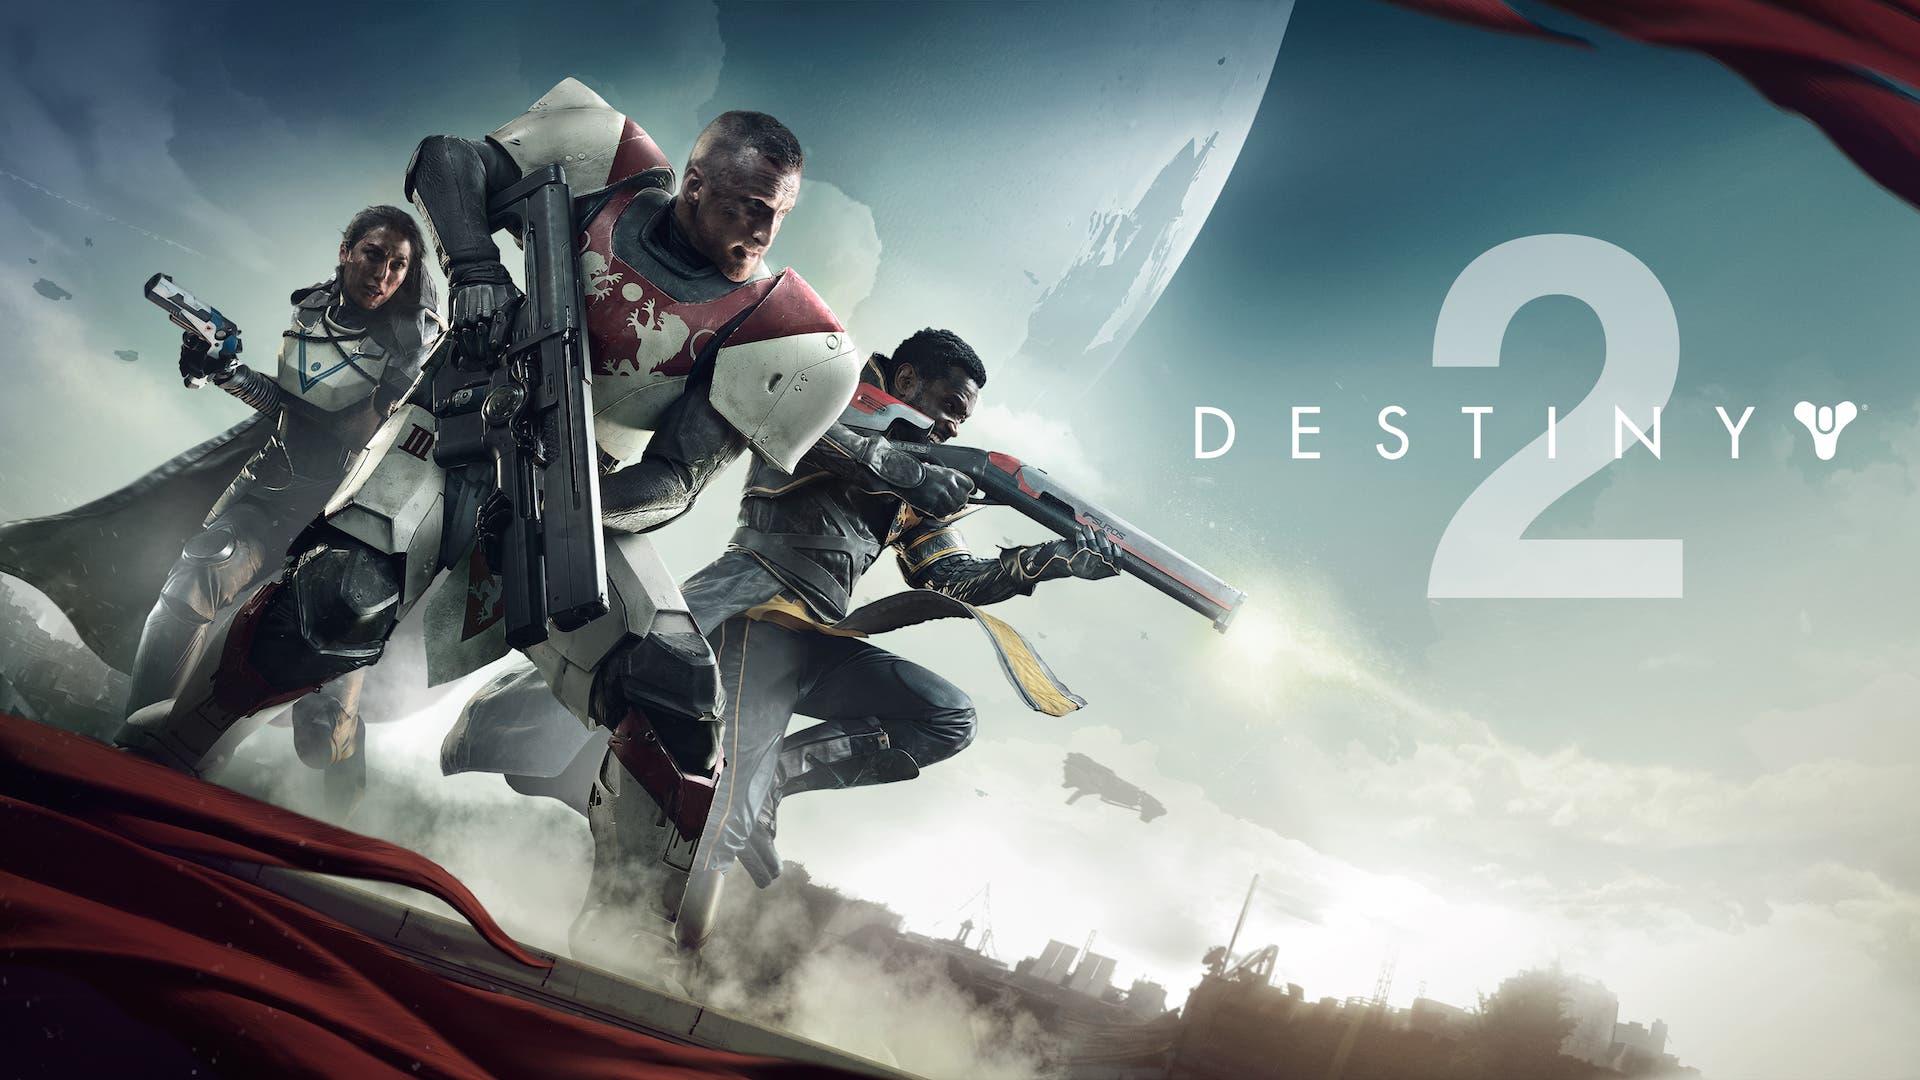 Destiny2 featured